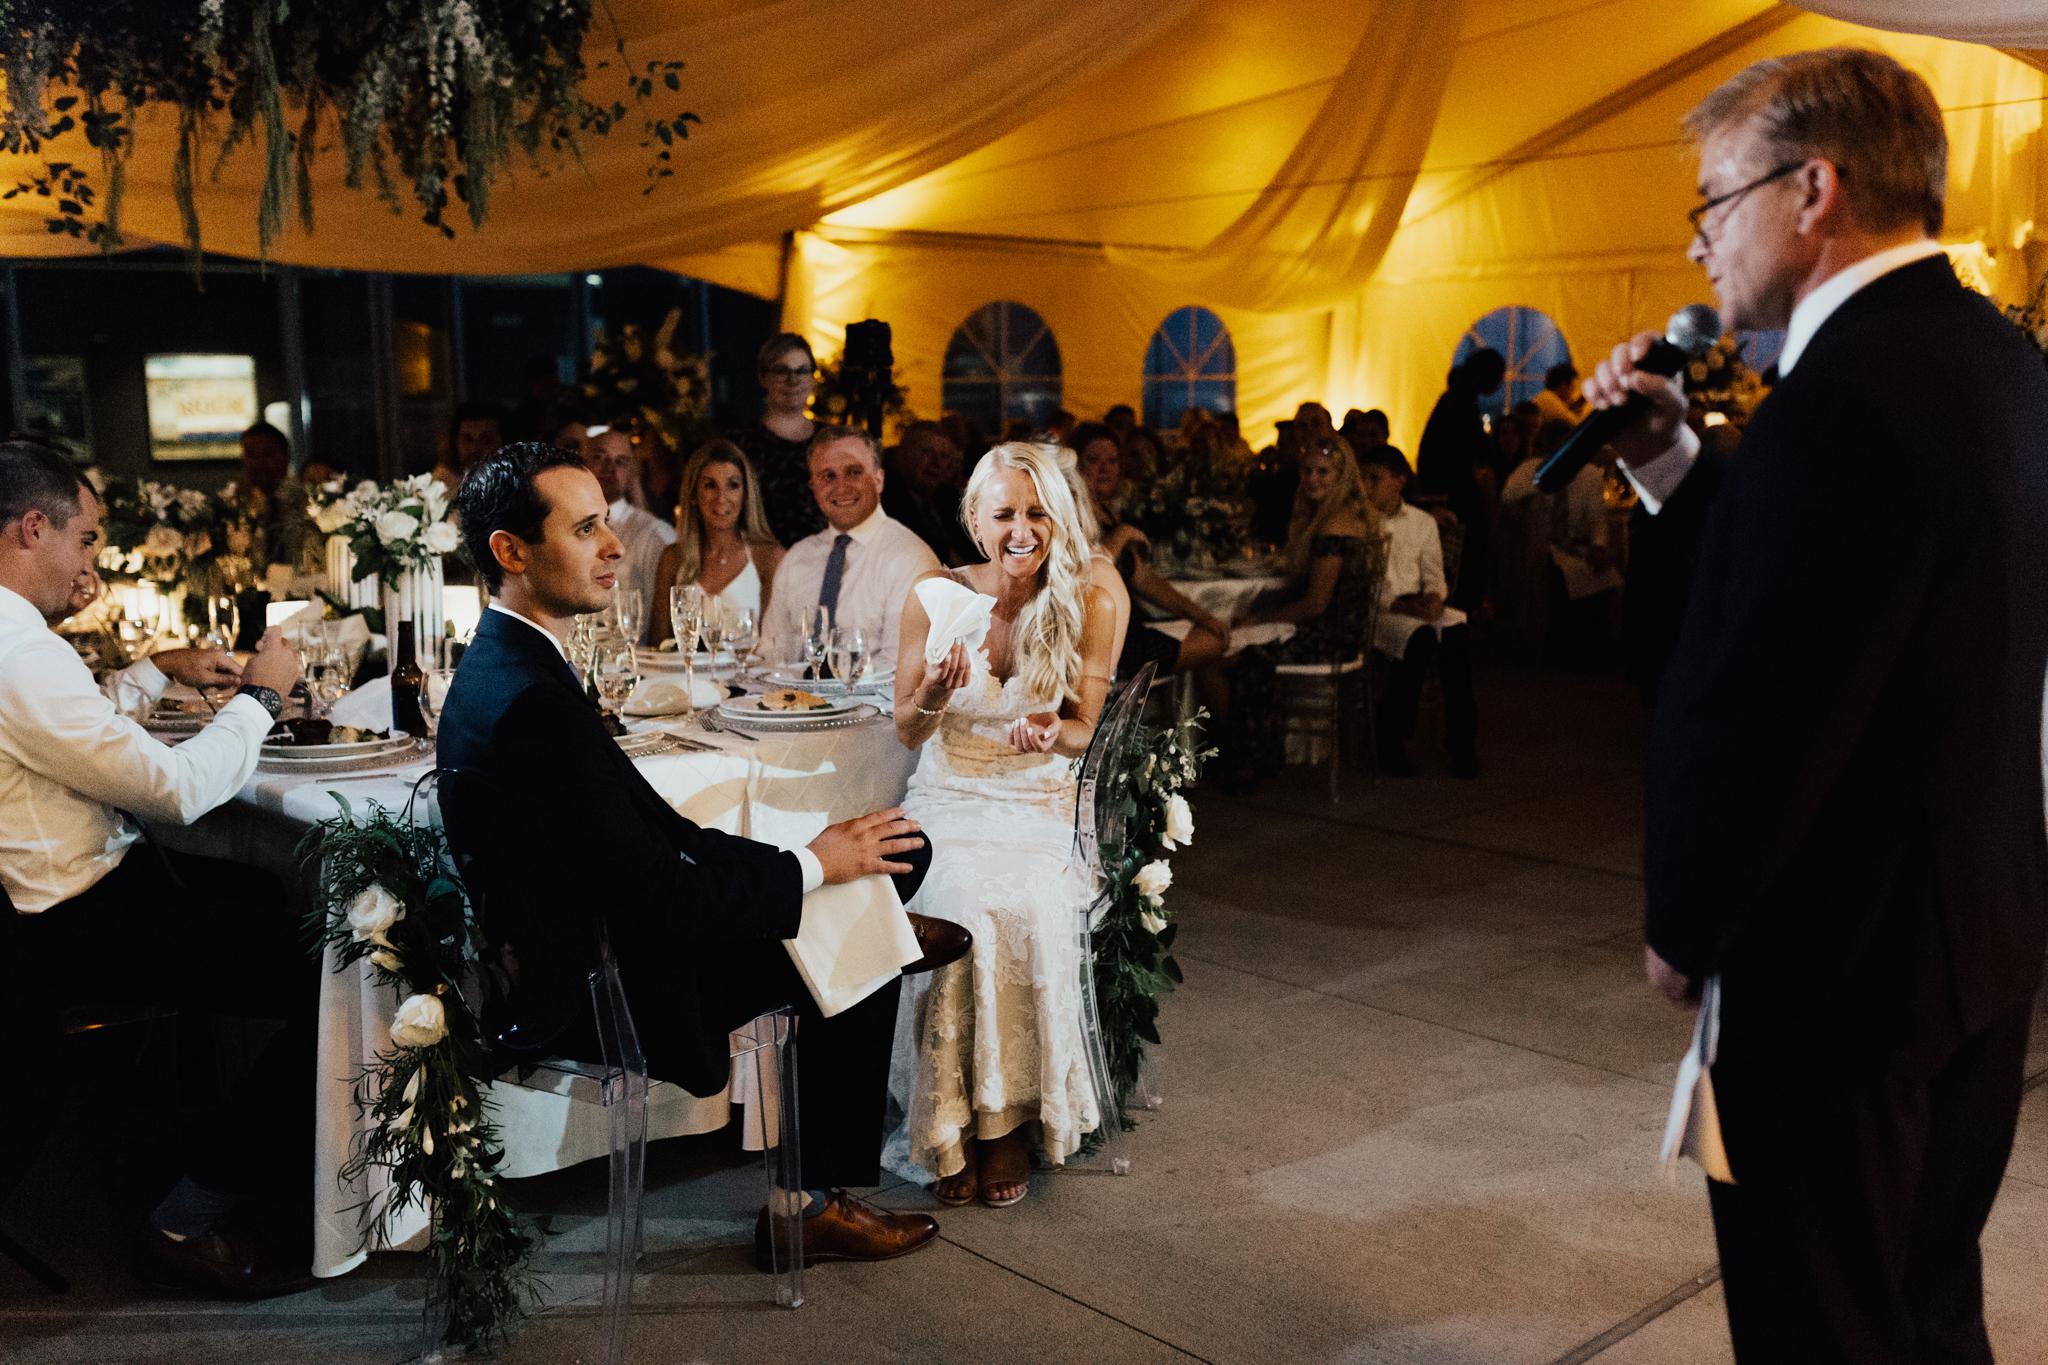 Arizona-Adventure-Elopement-Wedding-Photographer-31.jpg